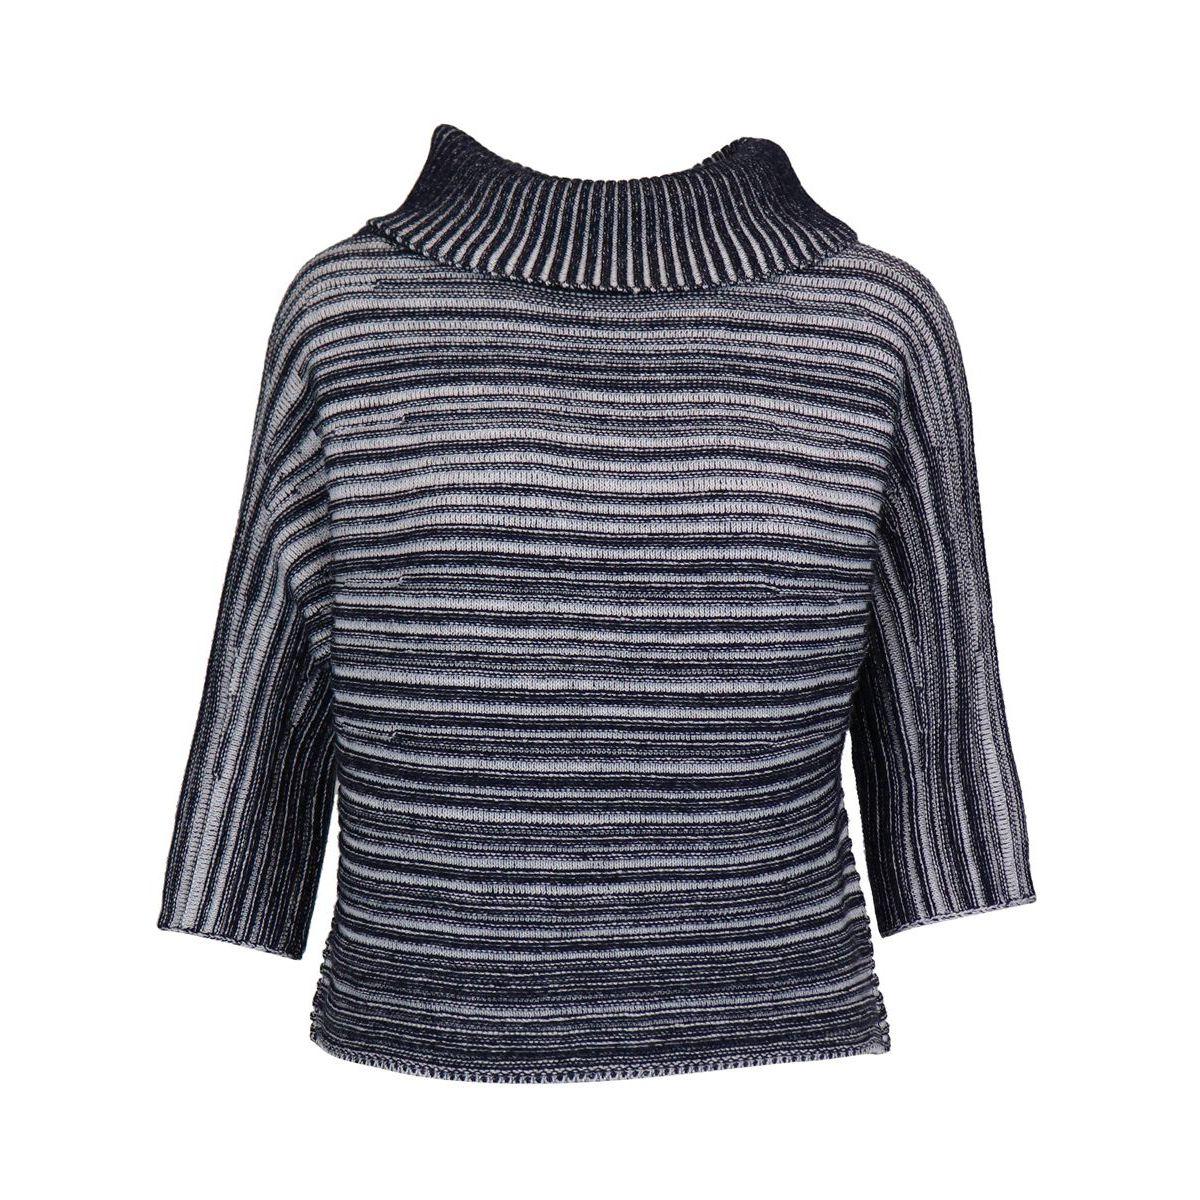 Three-quarter sleeve sweater in virgin wool White black Gran Sasso